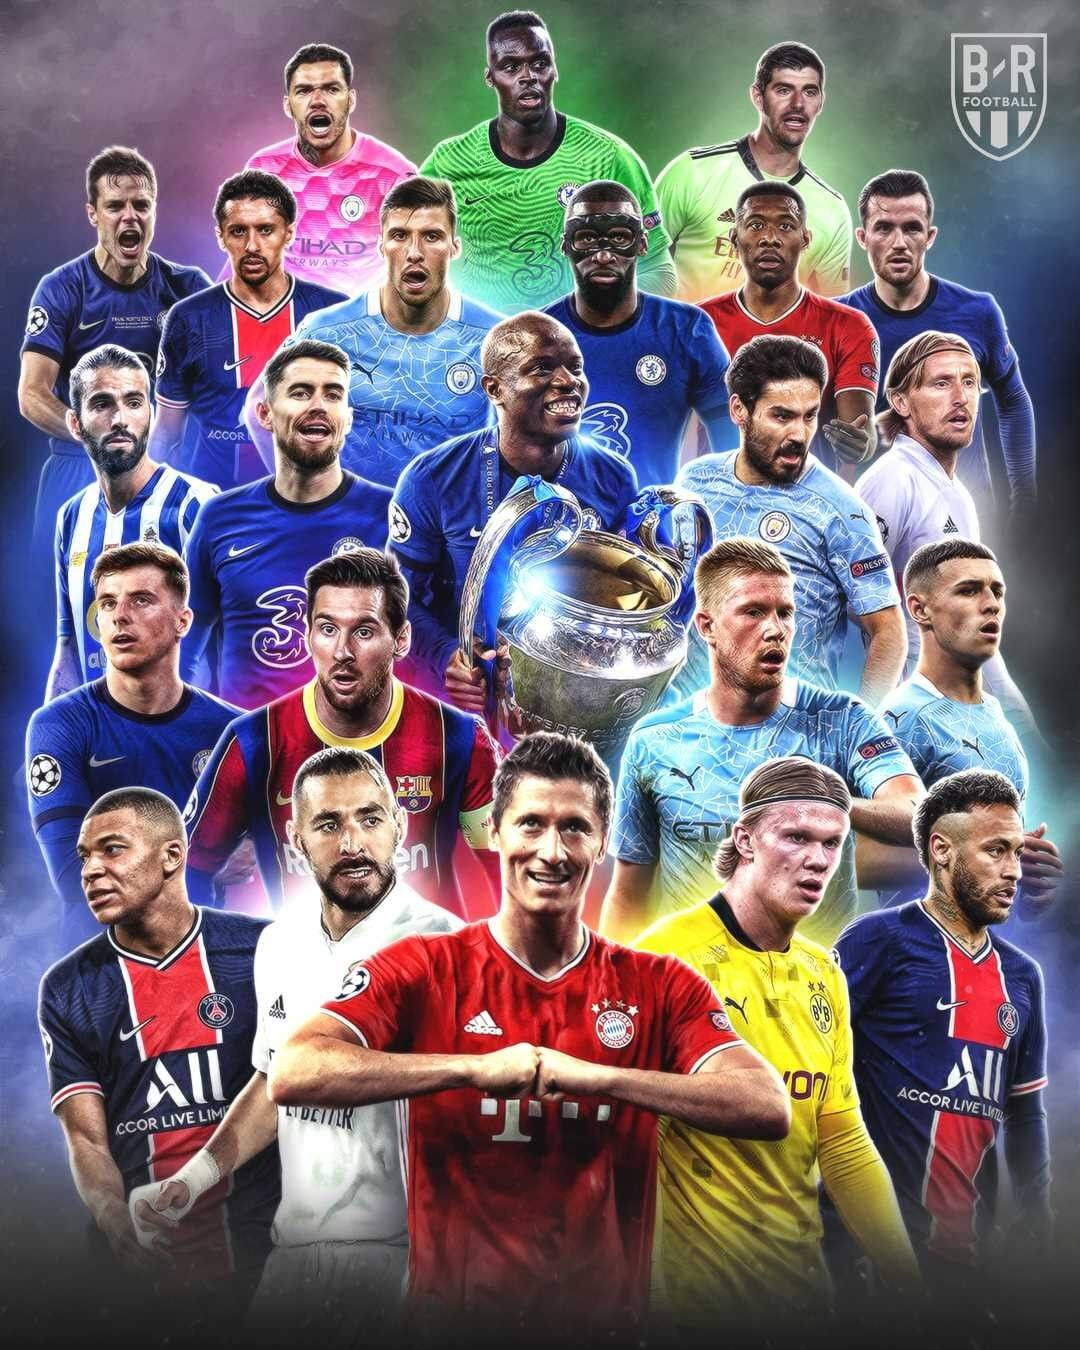 Bayern Munchen by Top Goal1